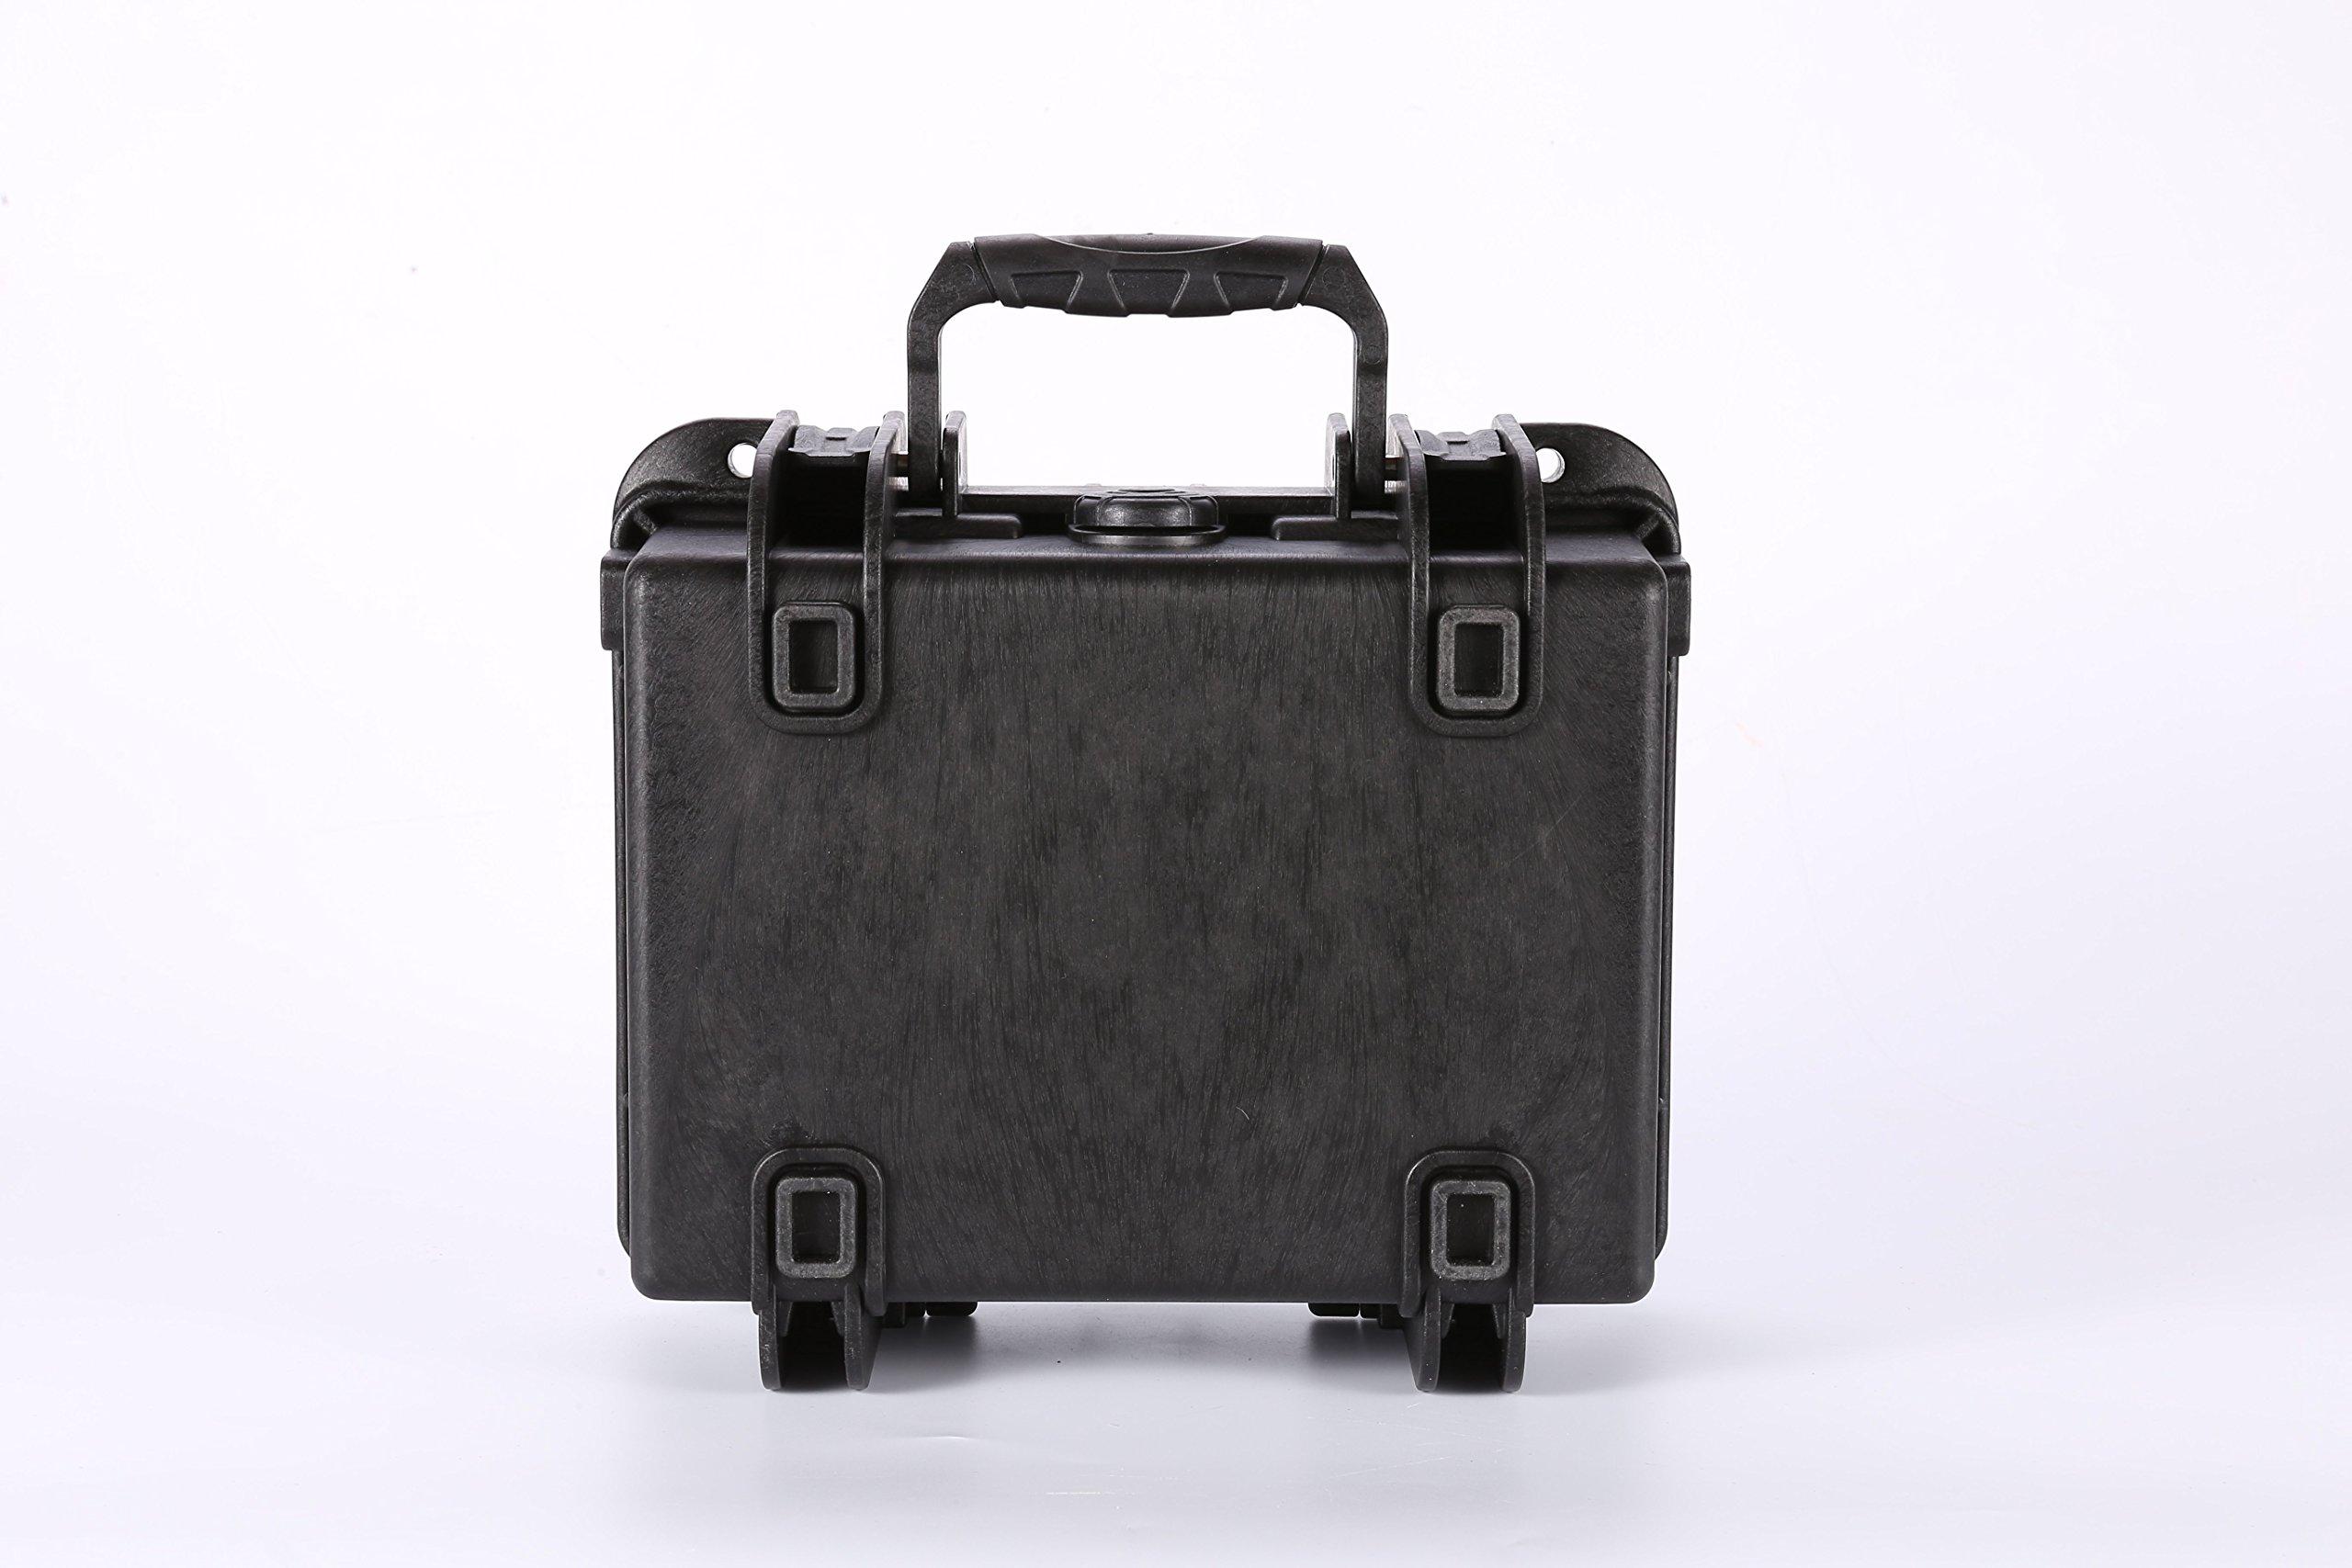 CigarPro Cigar Travel Humidor Case, Holds 10 Cigars, Waterproof, Crush Proof